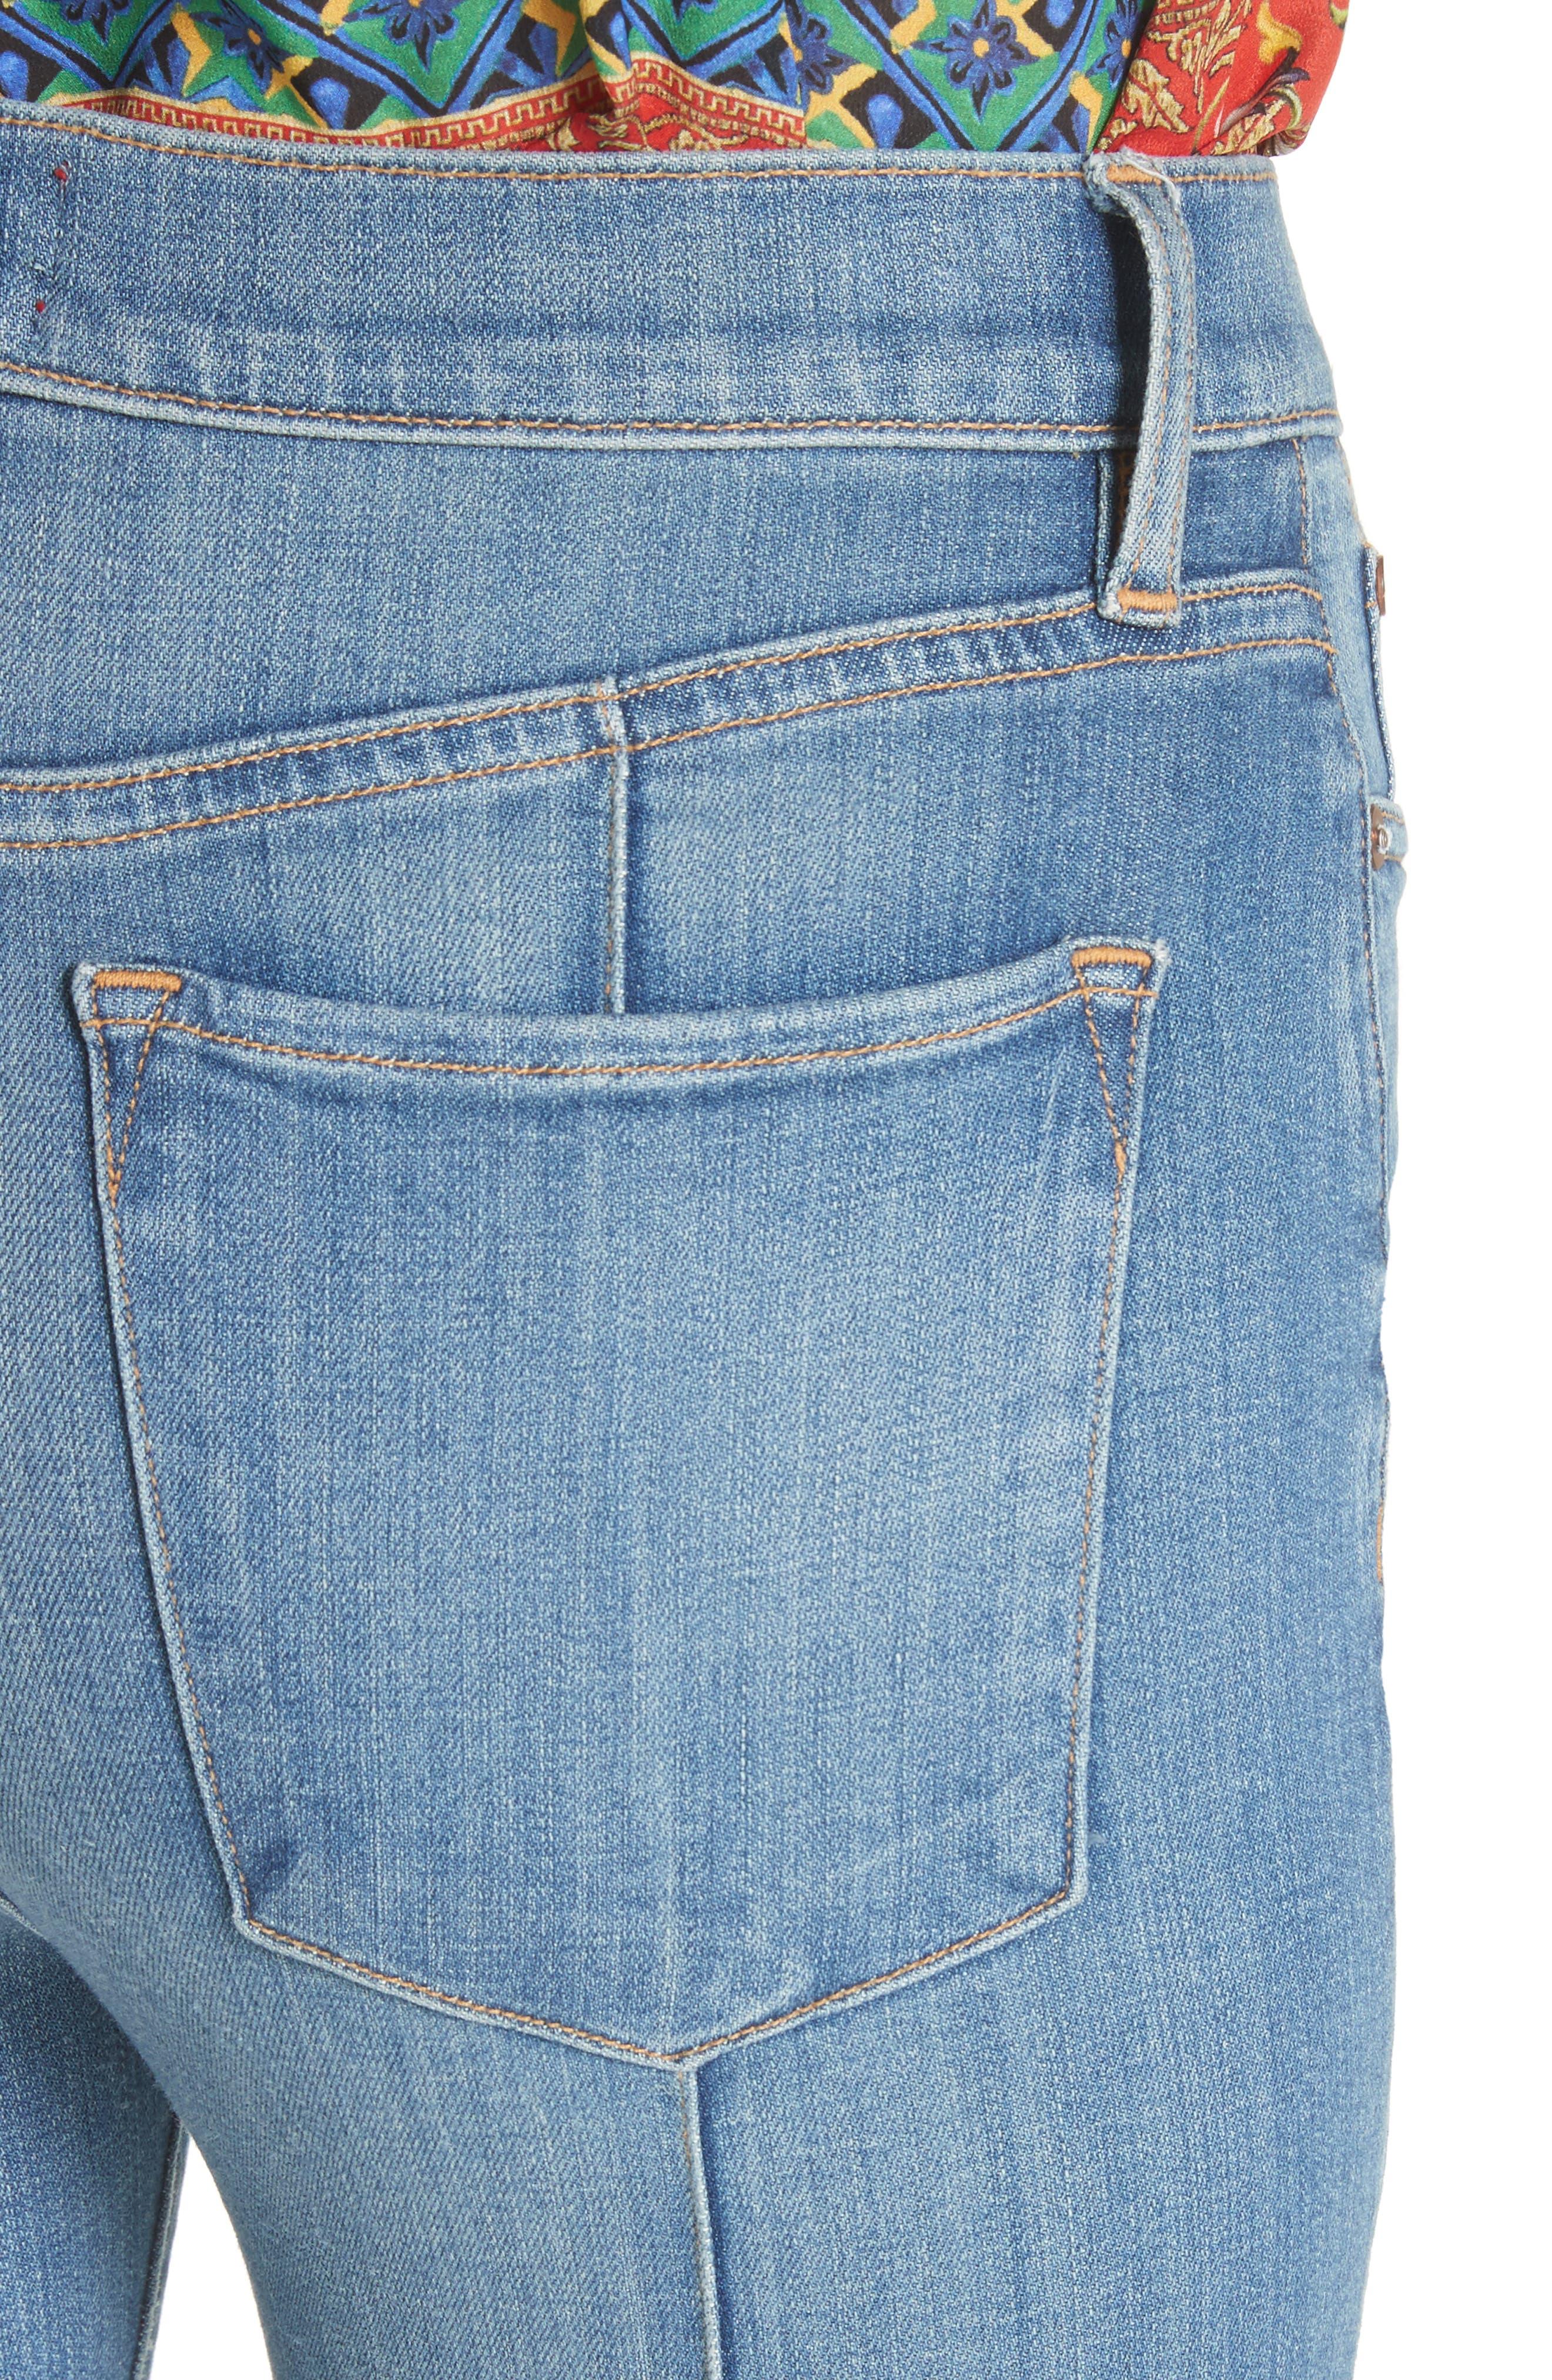 AO.LA Good High Waist Pintuck Skinny Jeans,                             Alternate thumbnail 4, color,                             Roadhouse Blues